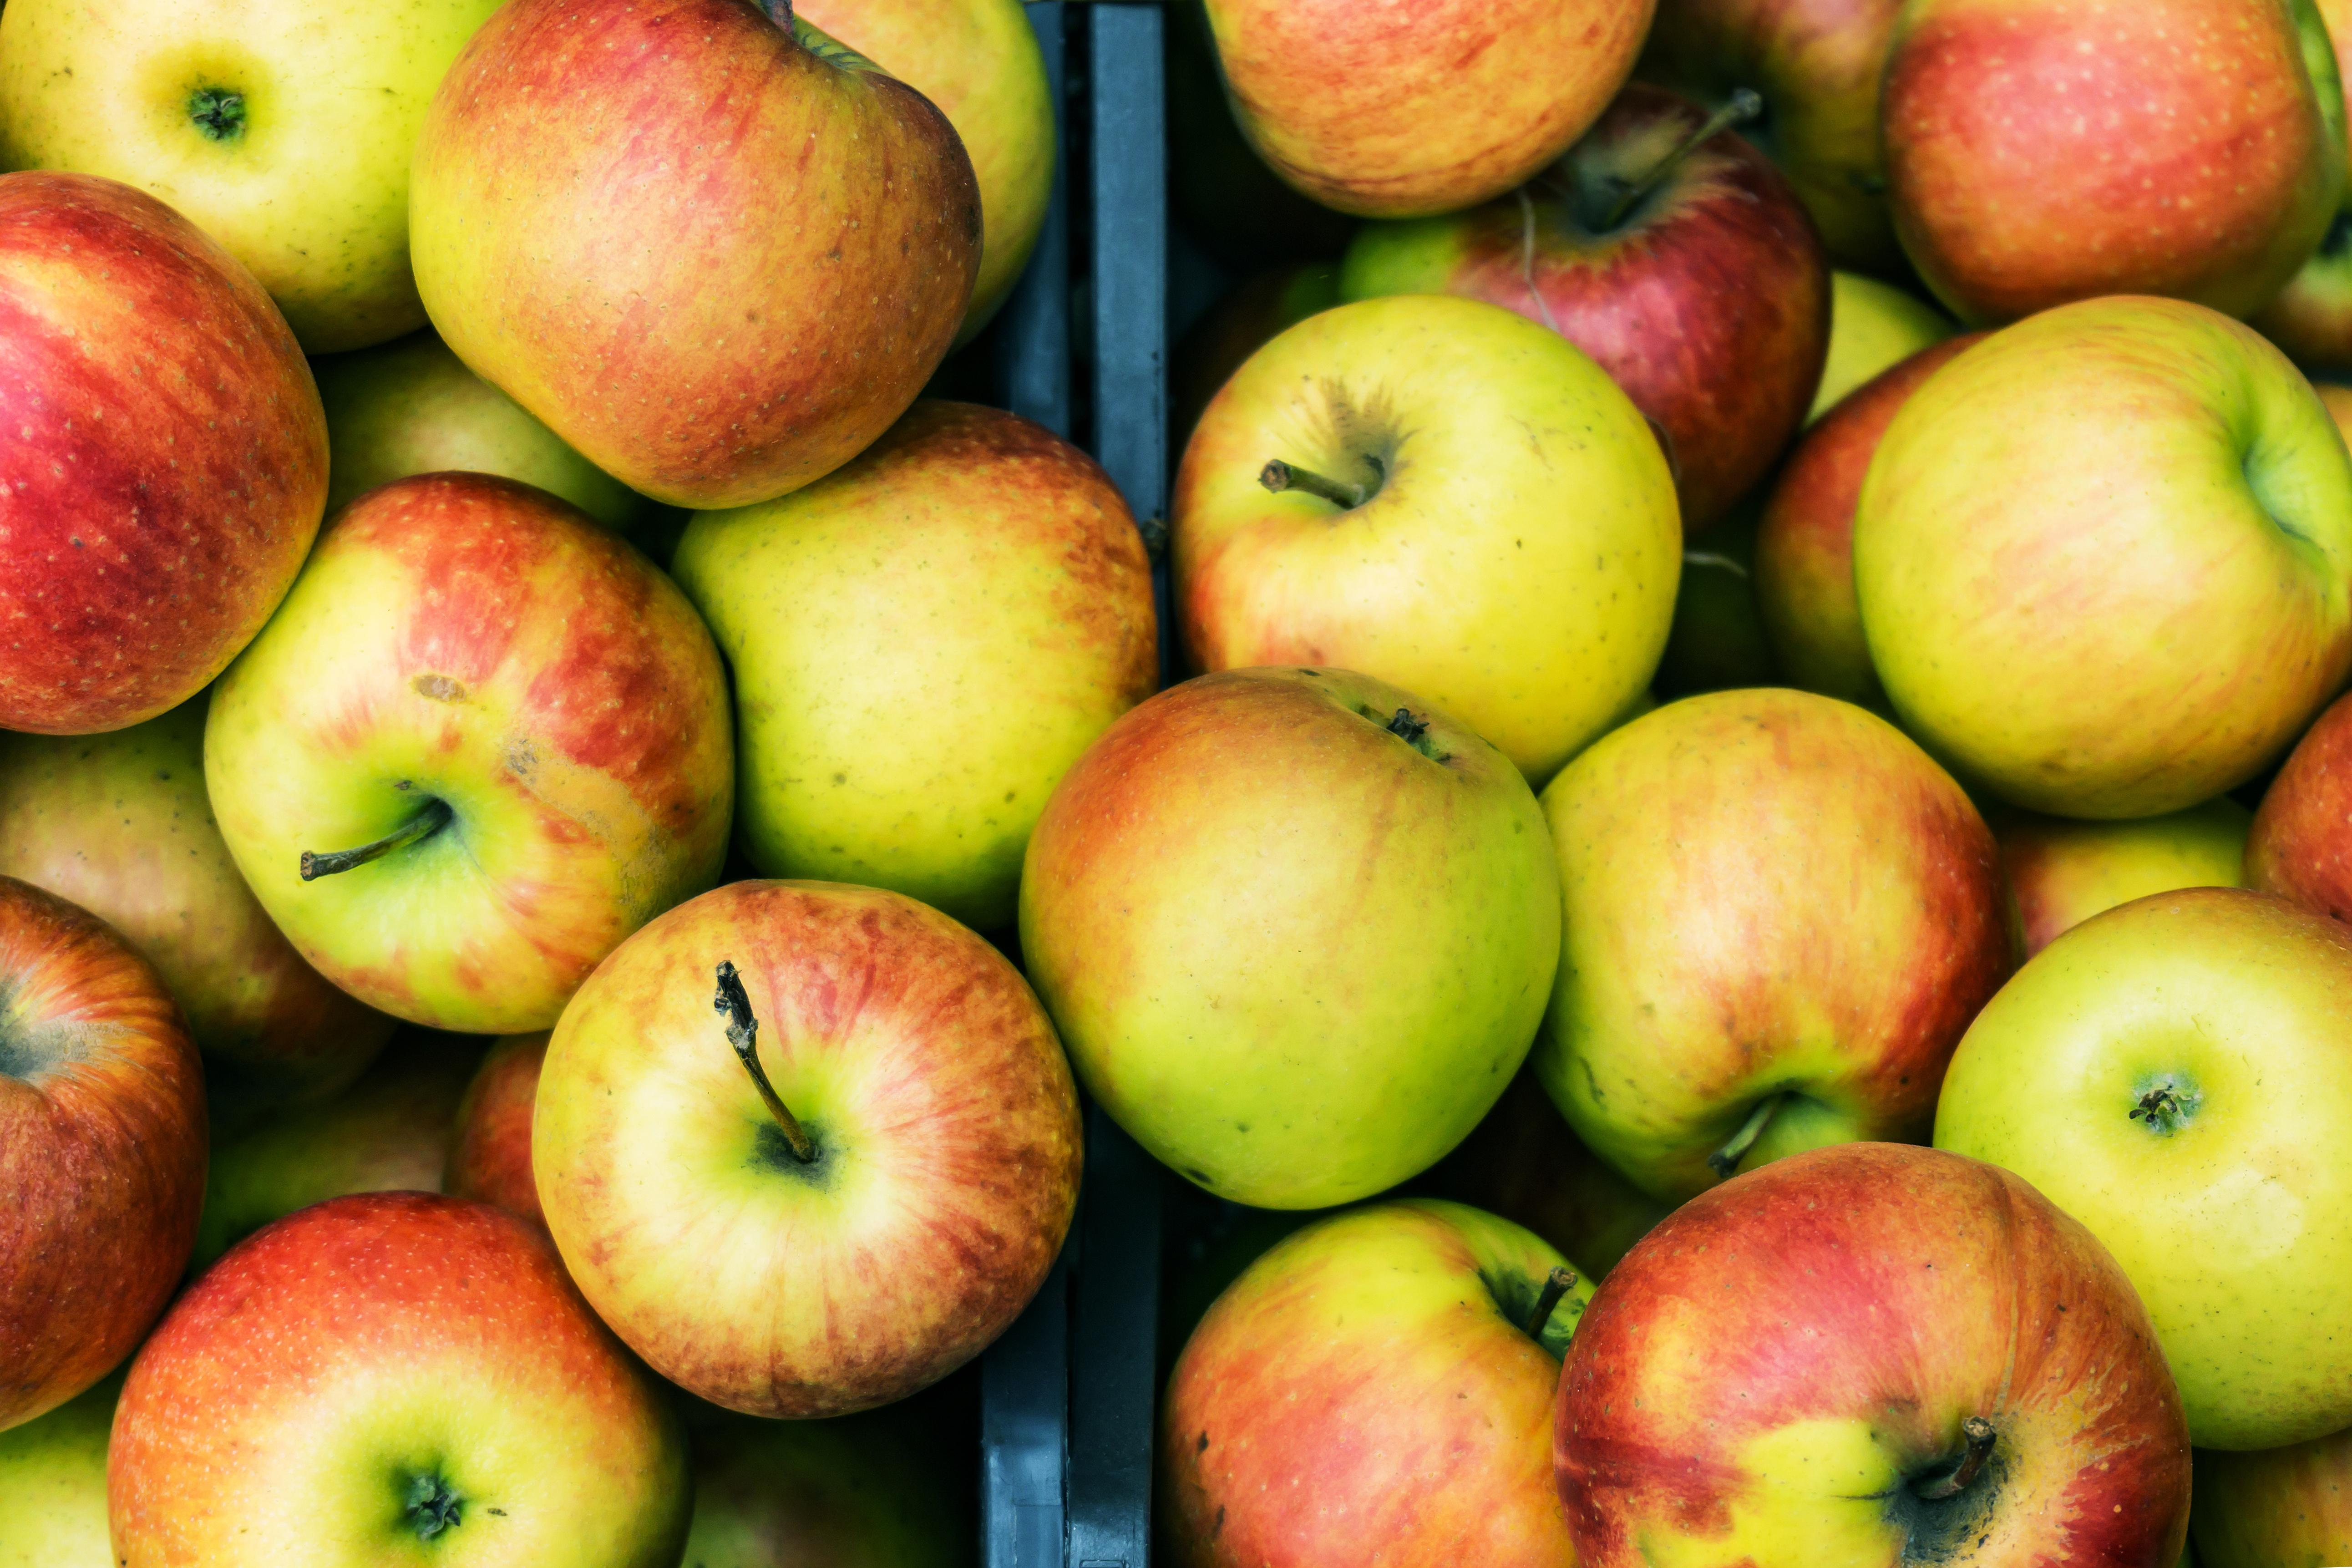 Organic Bulk Honeycrisp Apples - $1.99/lb!